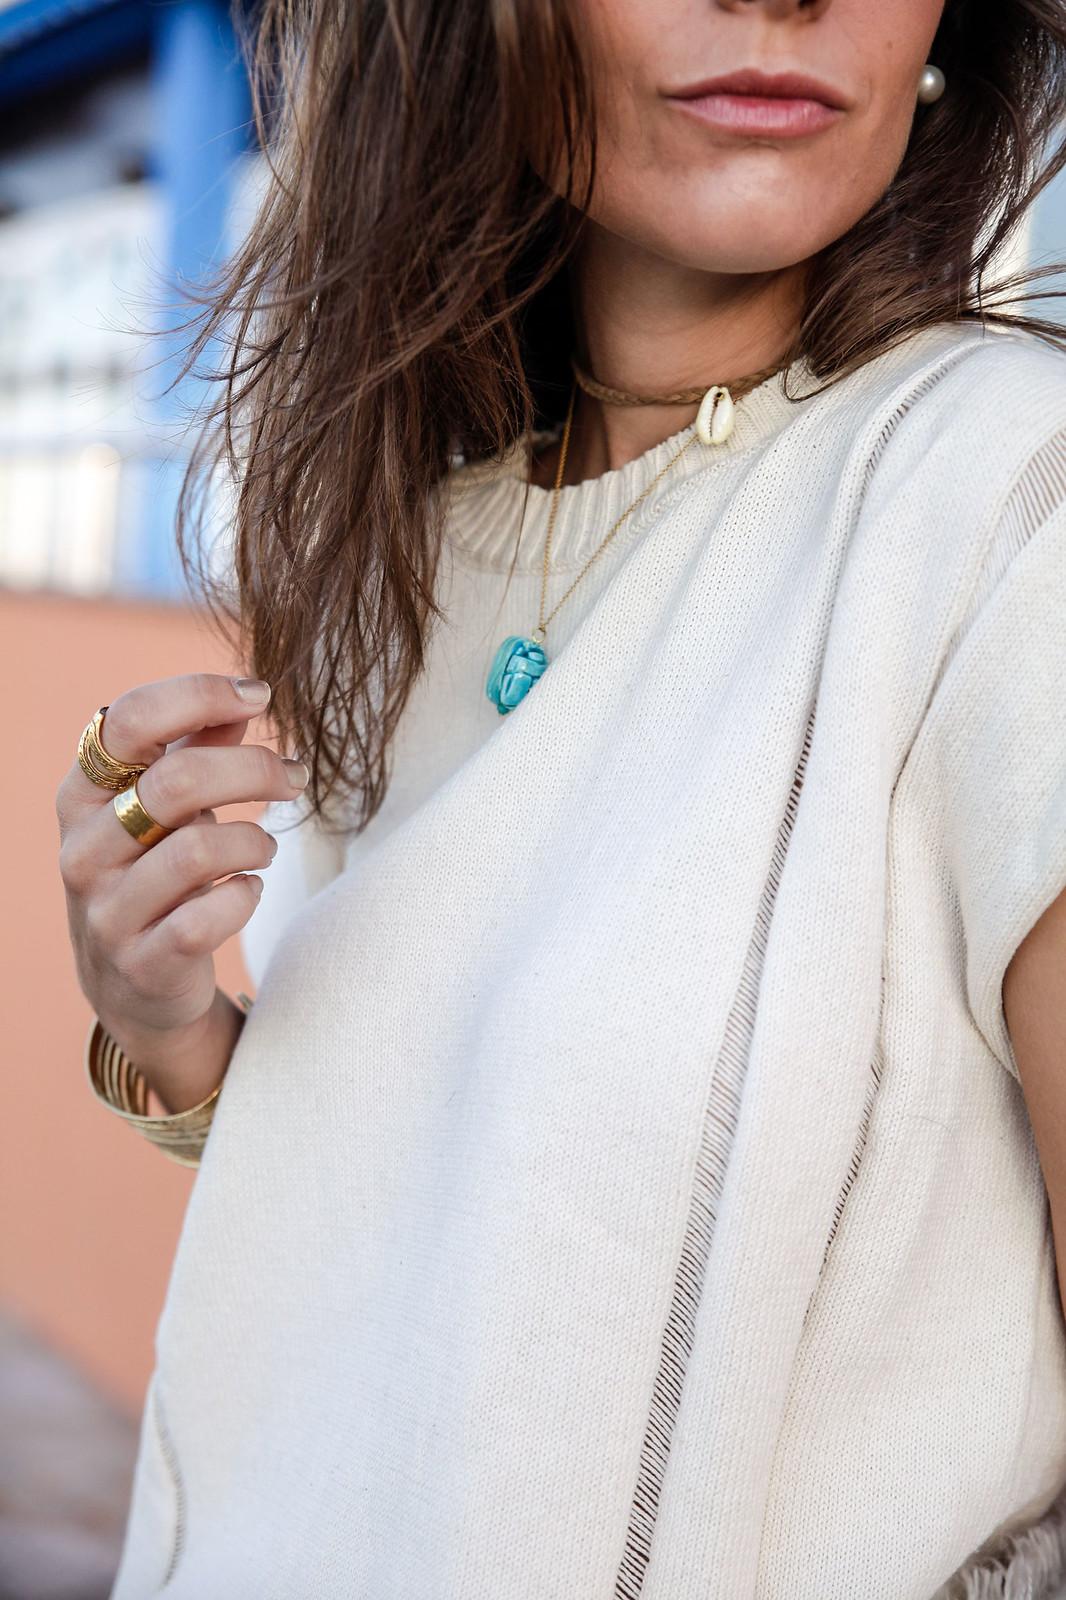 06_blusa_punto_falda_flores_summer_outfit_theguestgirl_rüga_schade_jewels_steve_madden_.magali_pasacal_influencer_barcelona_blogger